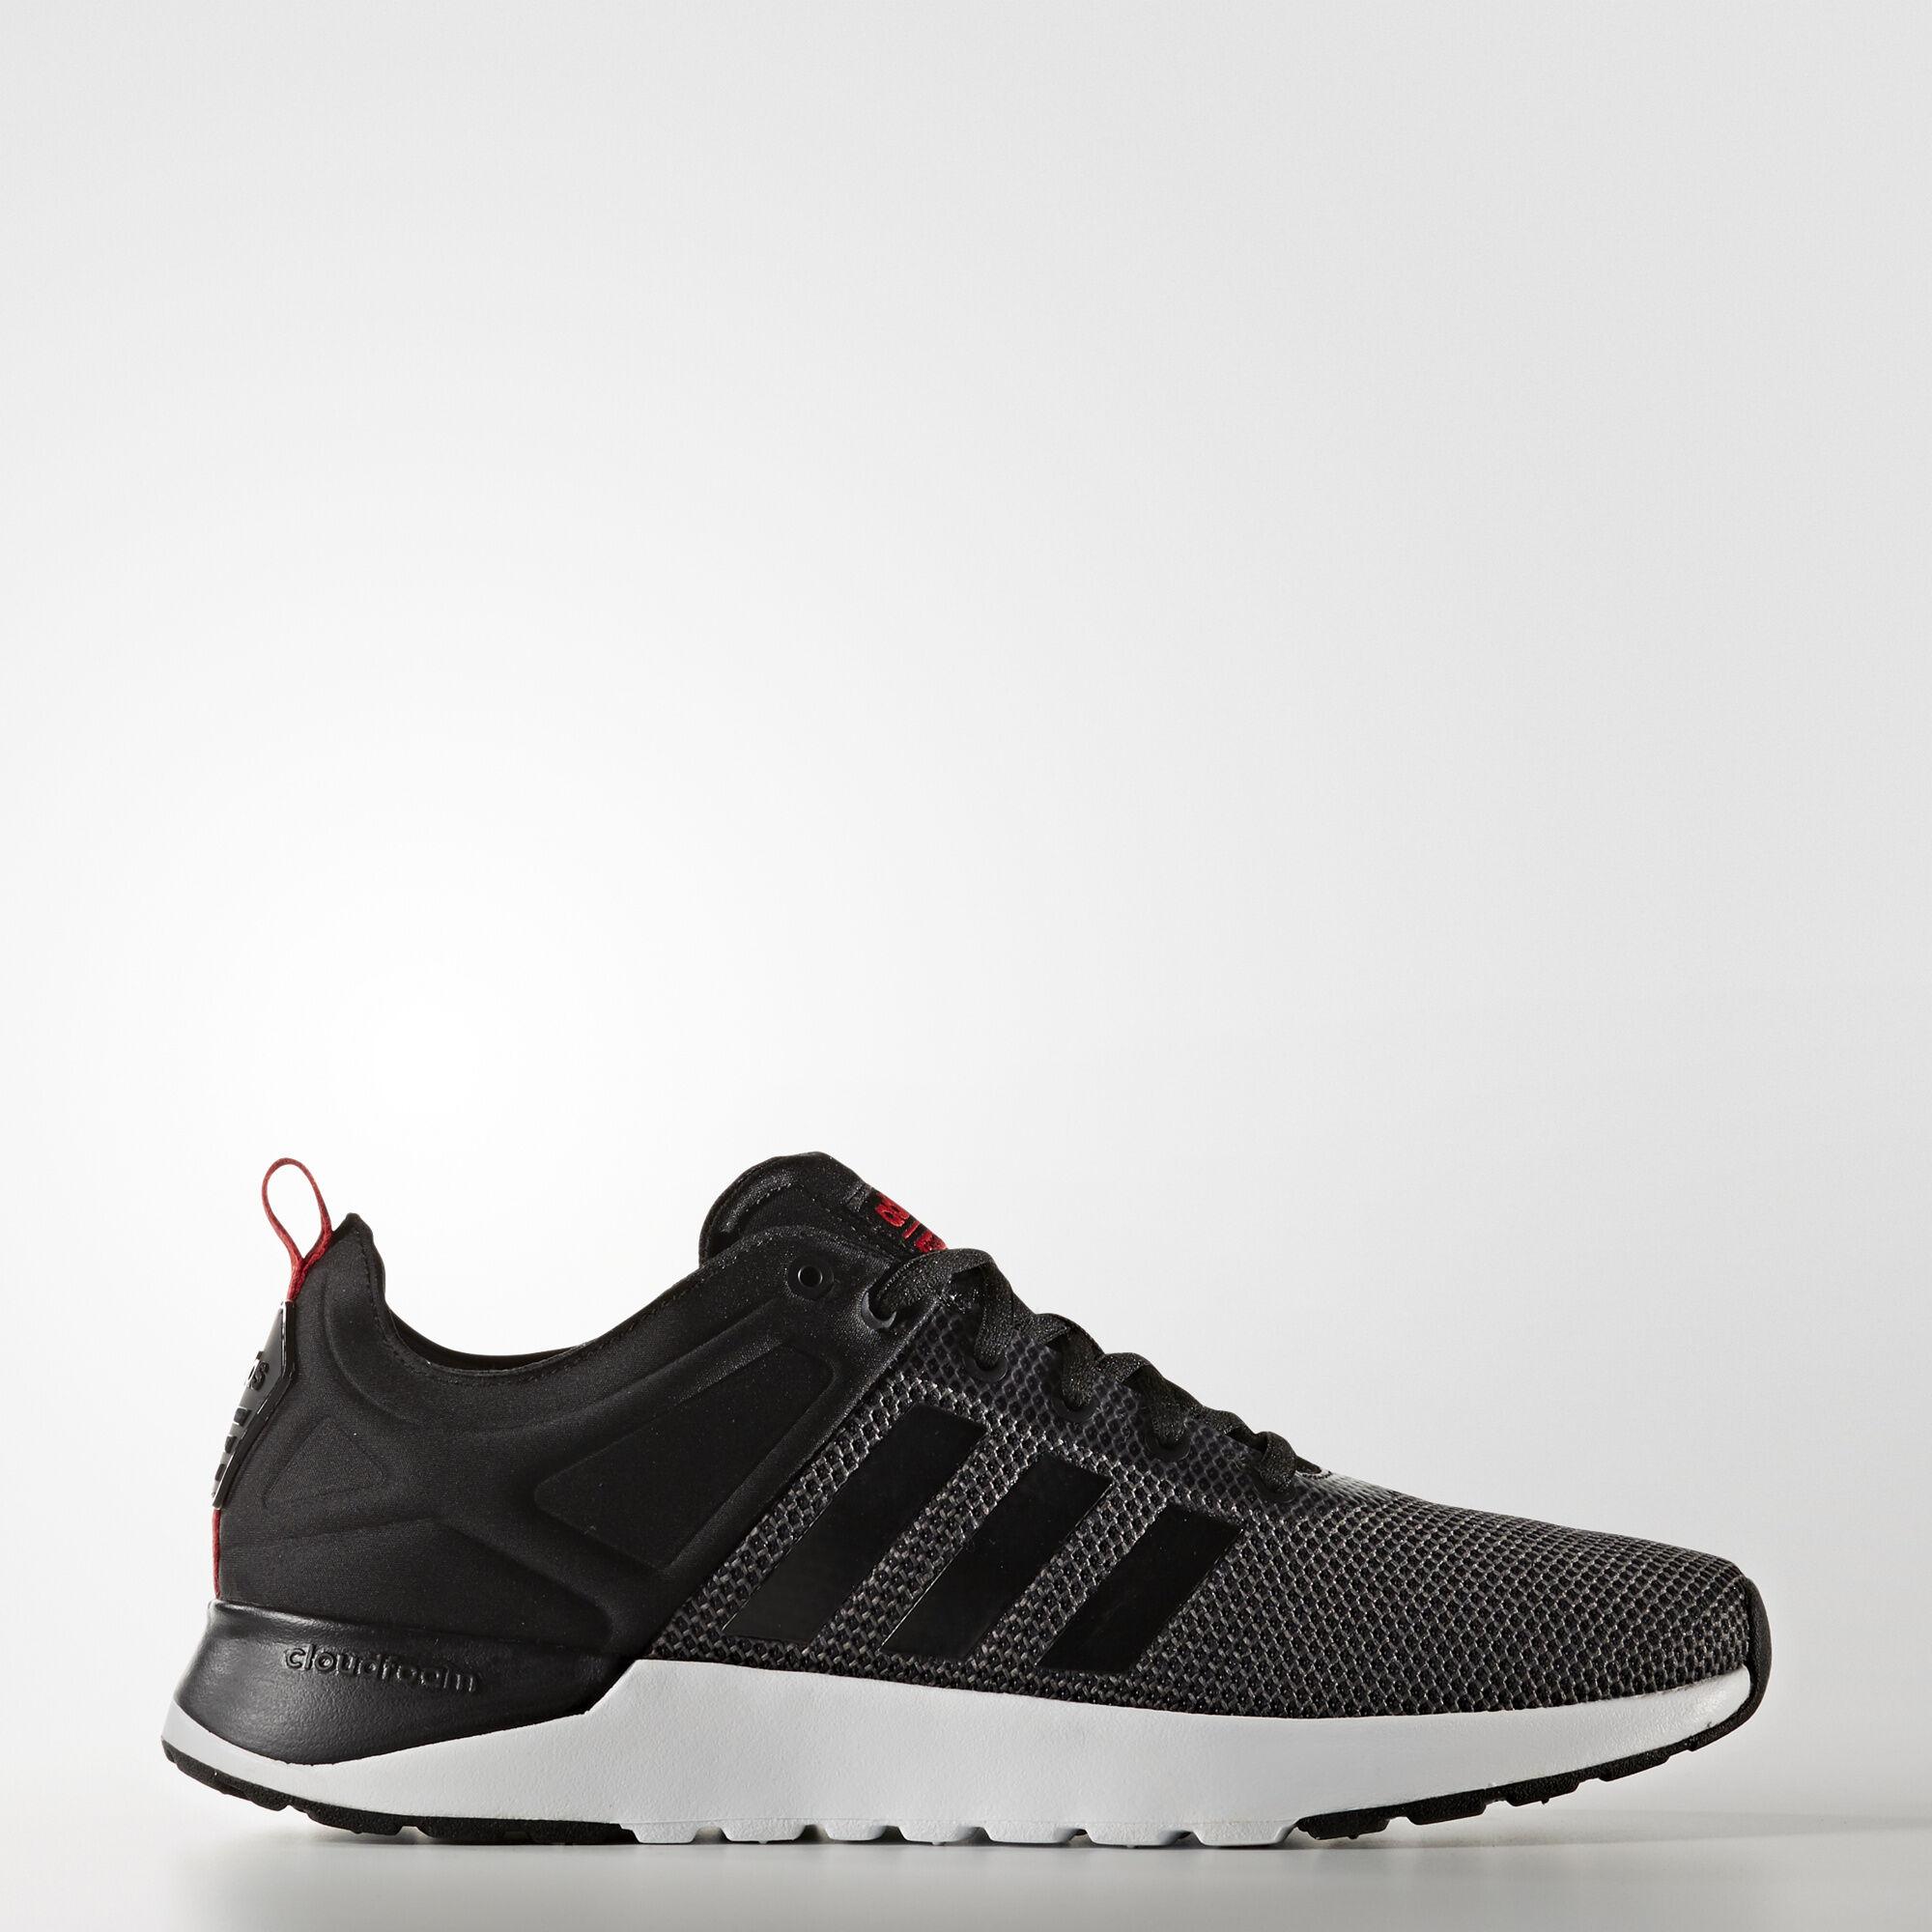 Adidas Neo Vs Jogging